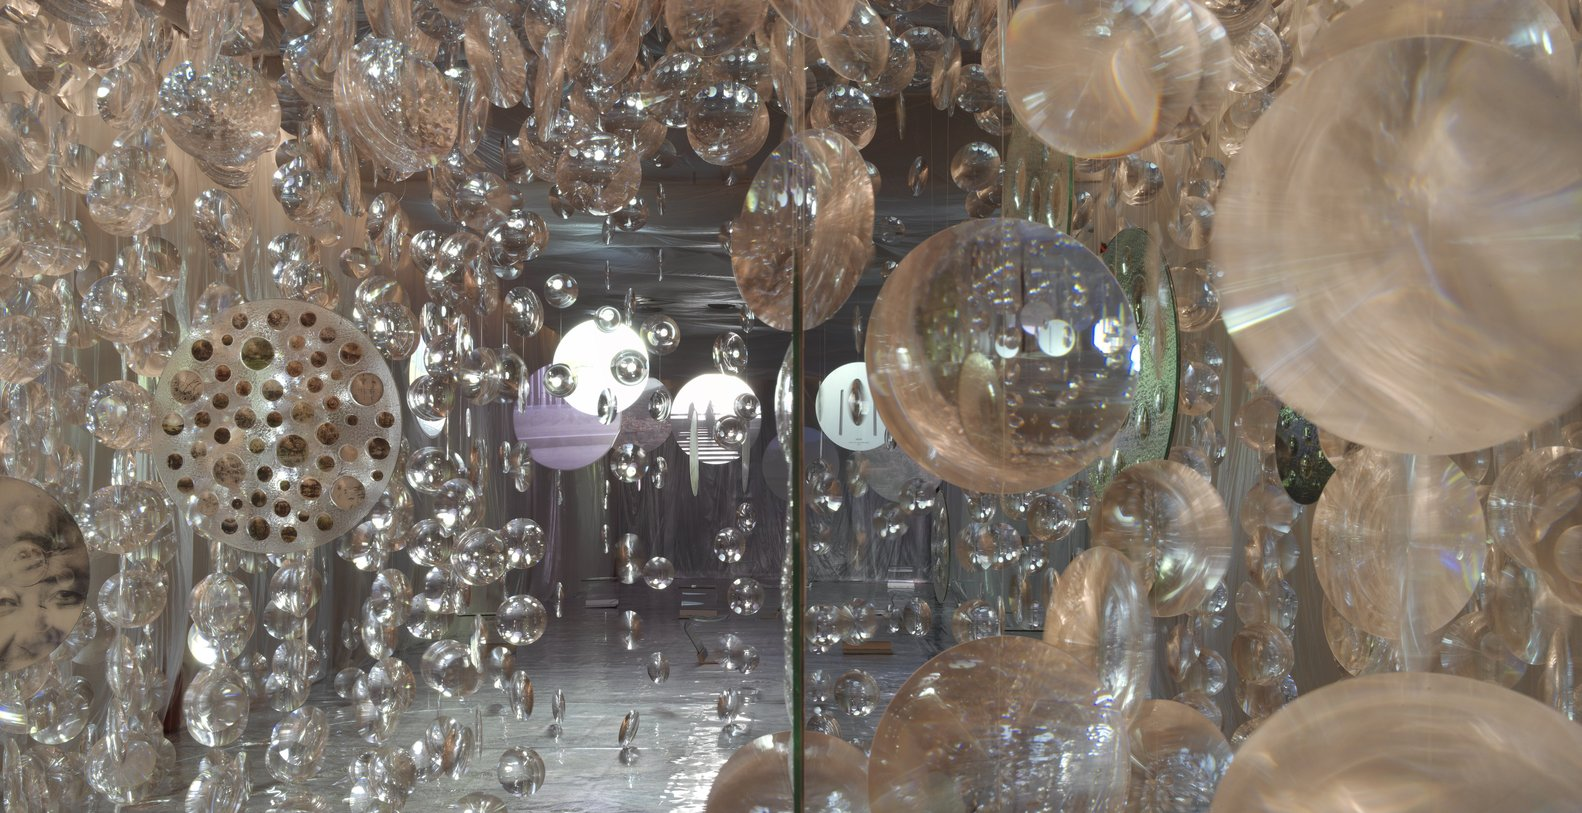 Dream-Nature -RCR -Arquitectes-bienal-venecia-Giuseppe-Dall-Arche-03